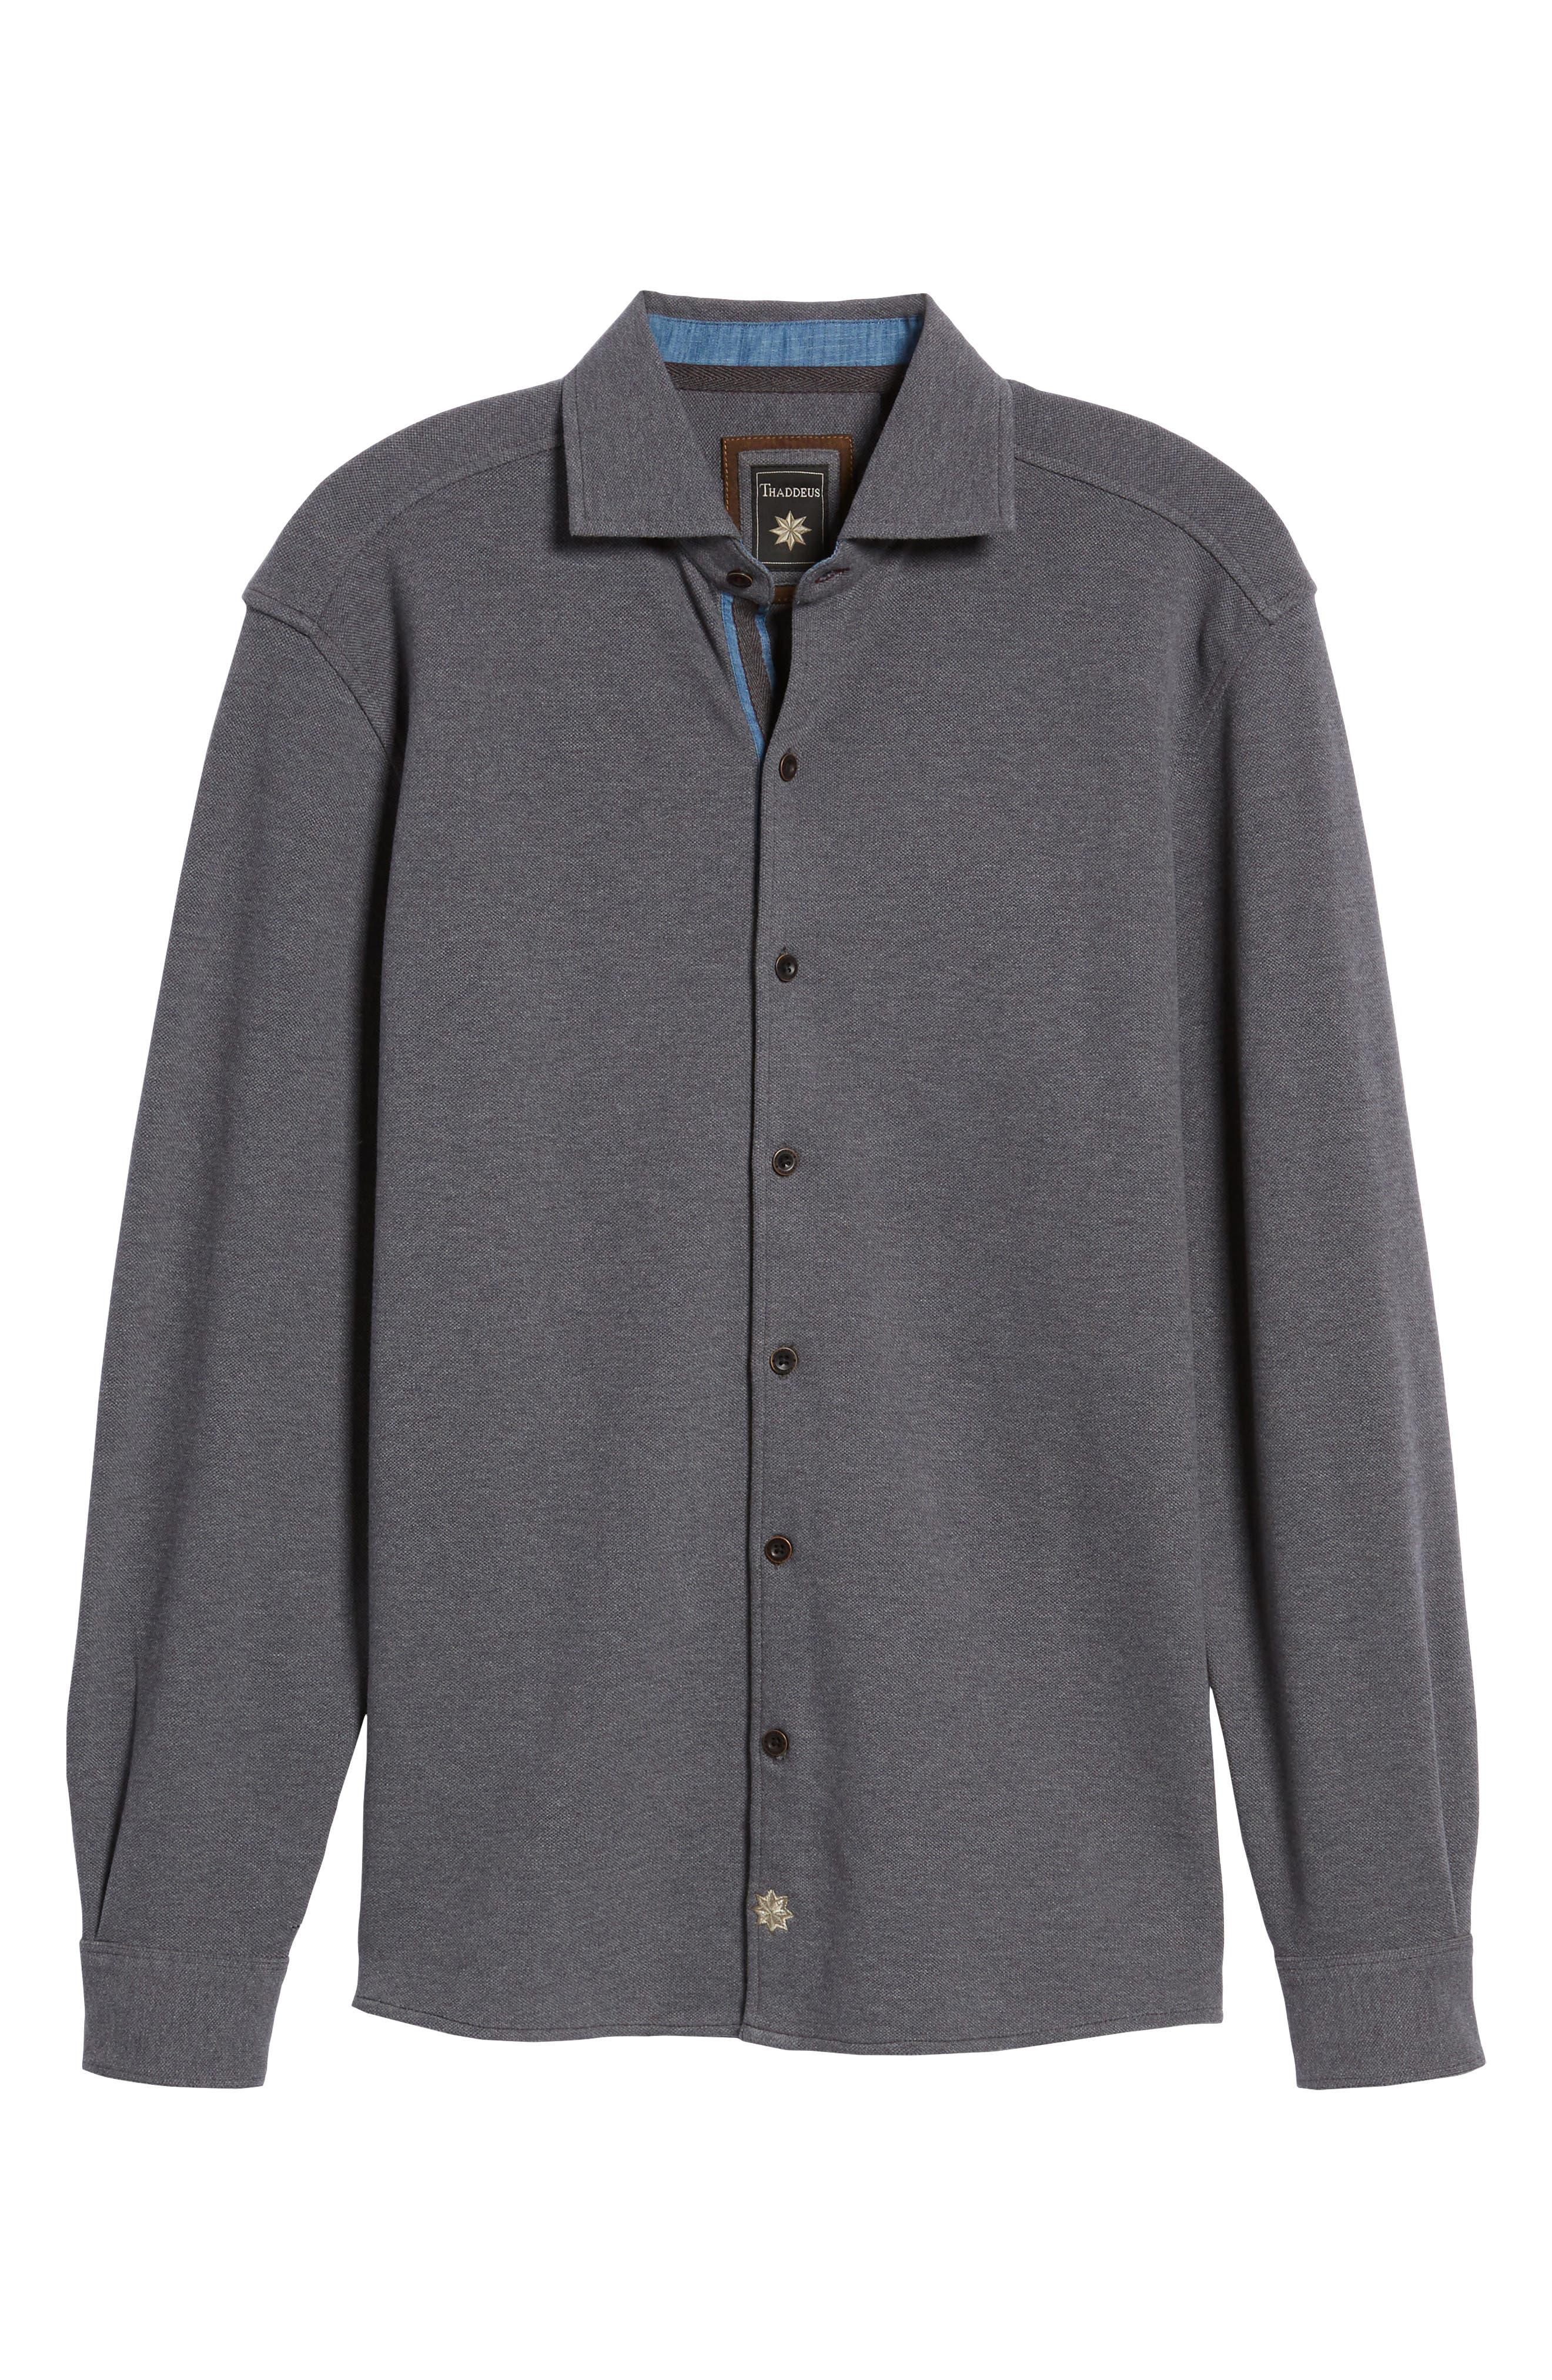 Shandy Heathered Knit Sport Shirt,                             Alternate thumbnail 6, color,                             014